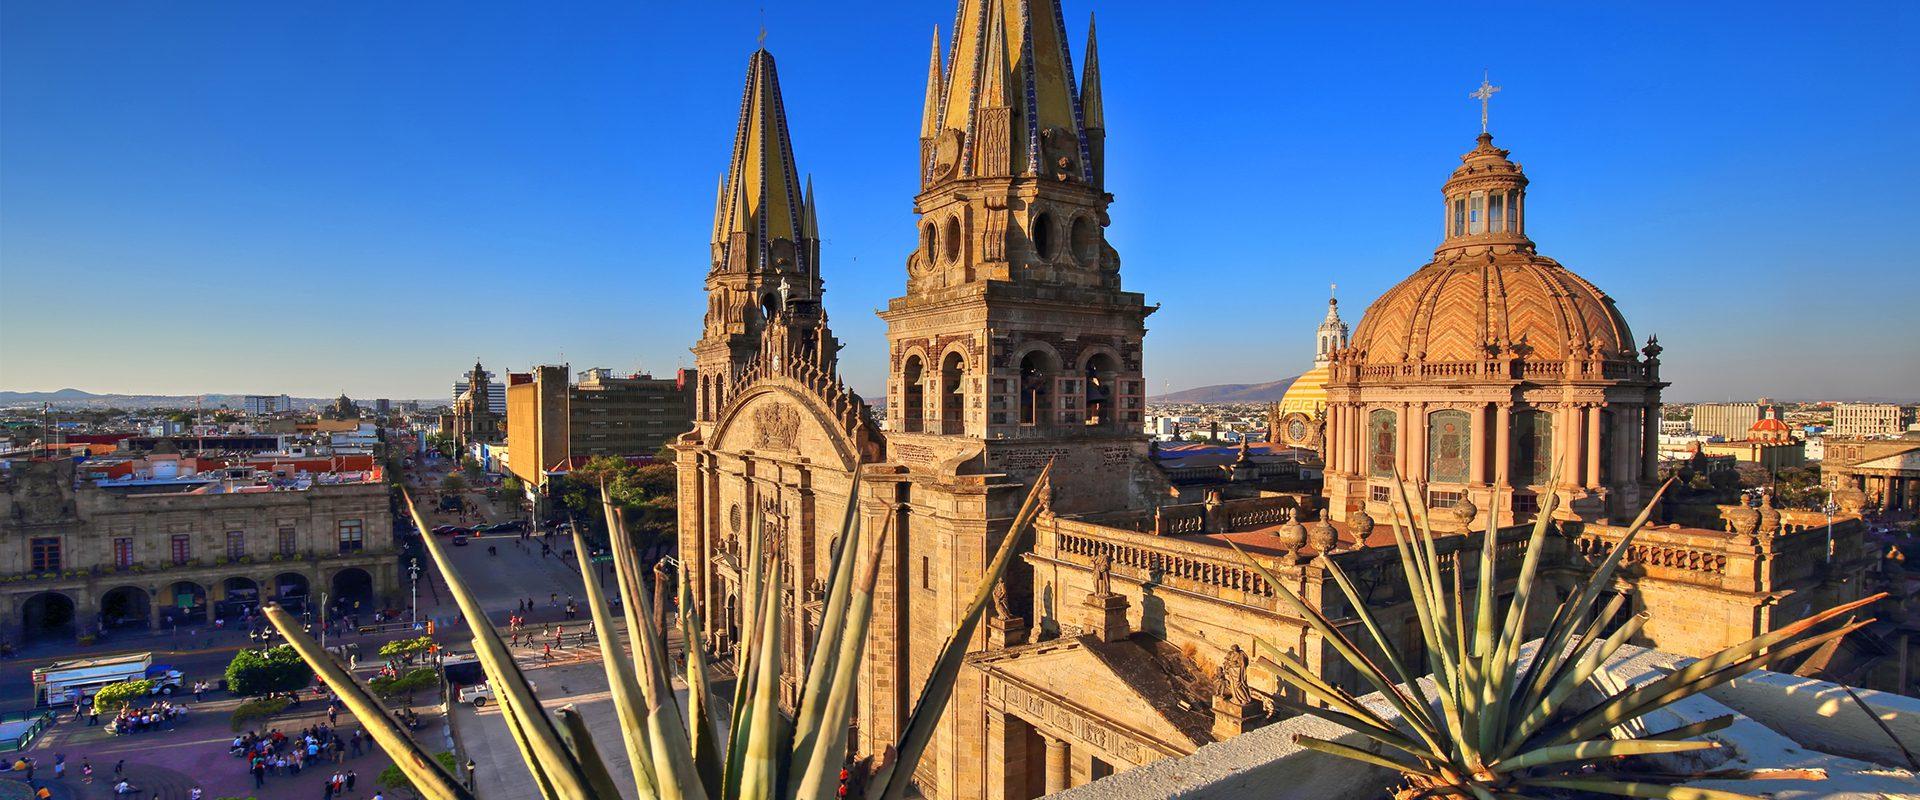 Guadalajara - Viajeros con B